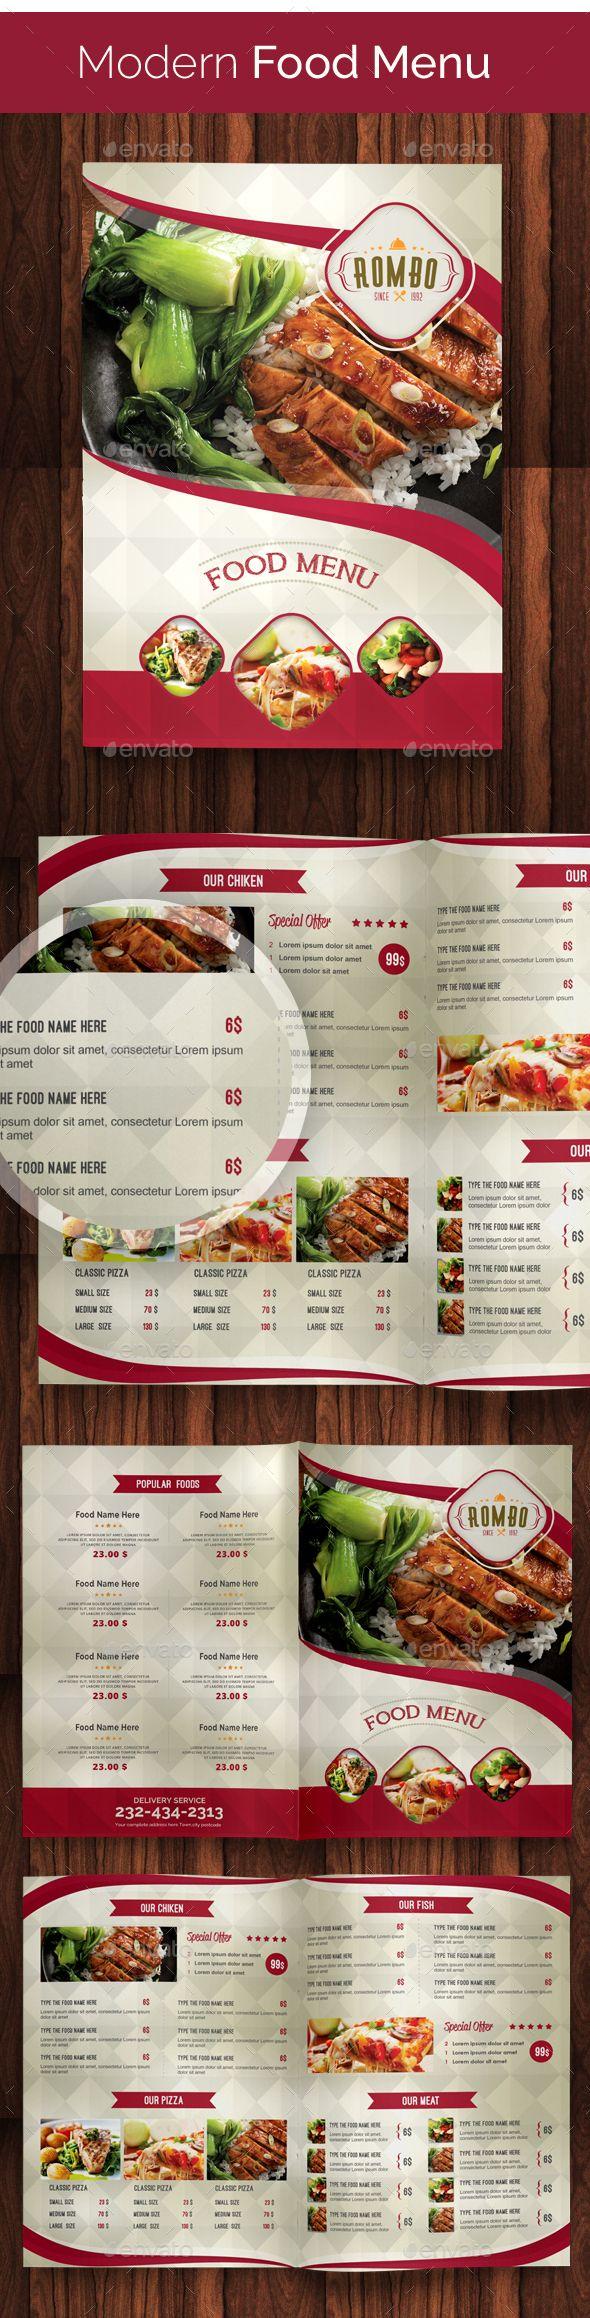 Modern Food Menu Template PSD #design Download: http://graphicriver.net/item/modern-food-menu-02/14121673?ref=ksioks